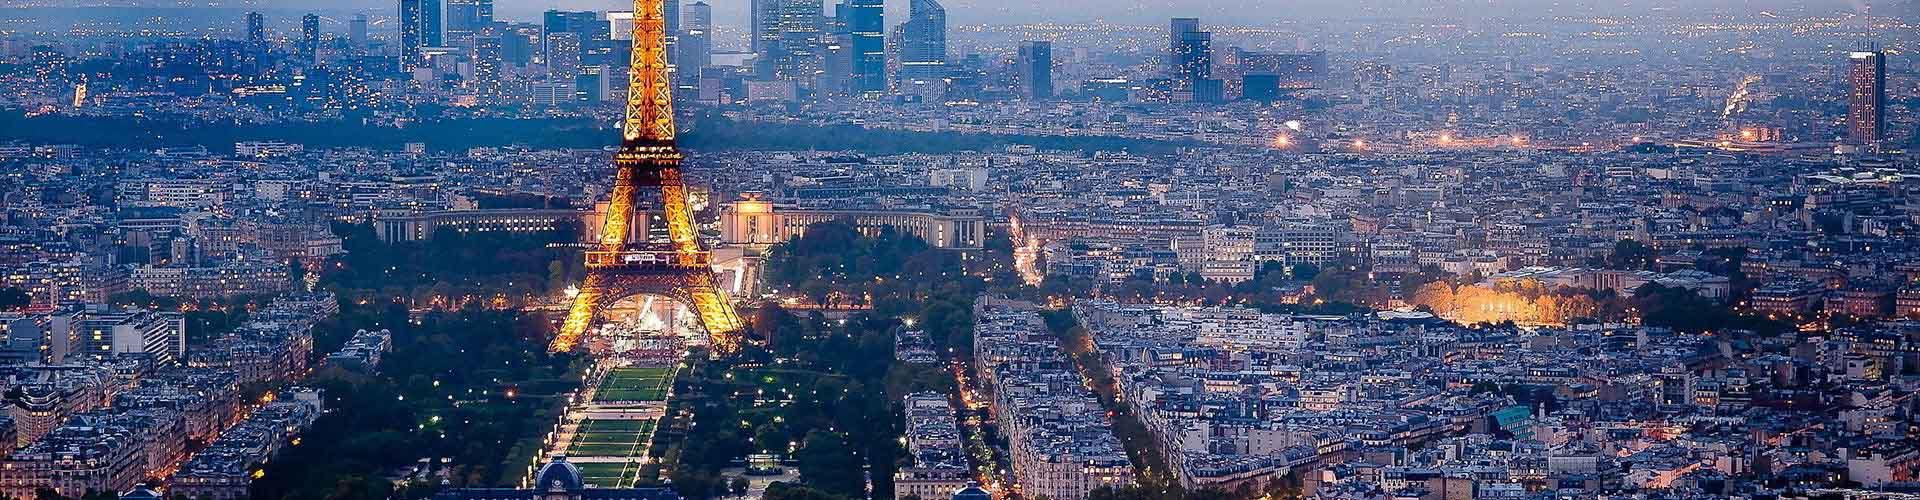 París - Apartamentos cerca a City Center. Mapas de París, Fotos y comentarios de cada Apartamento en París.